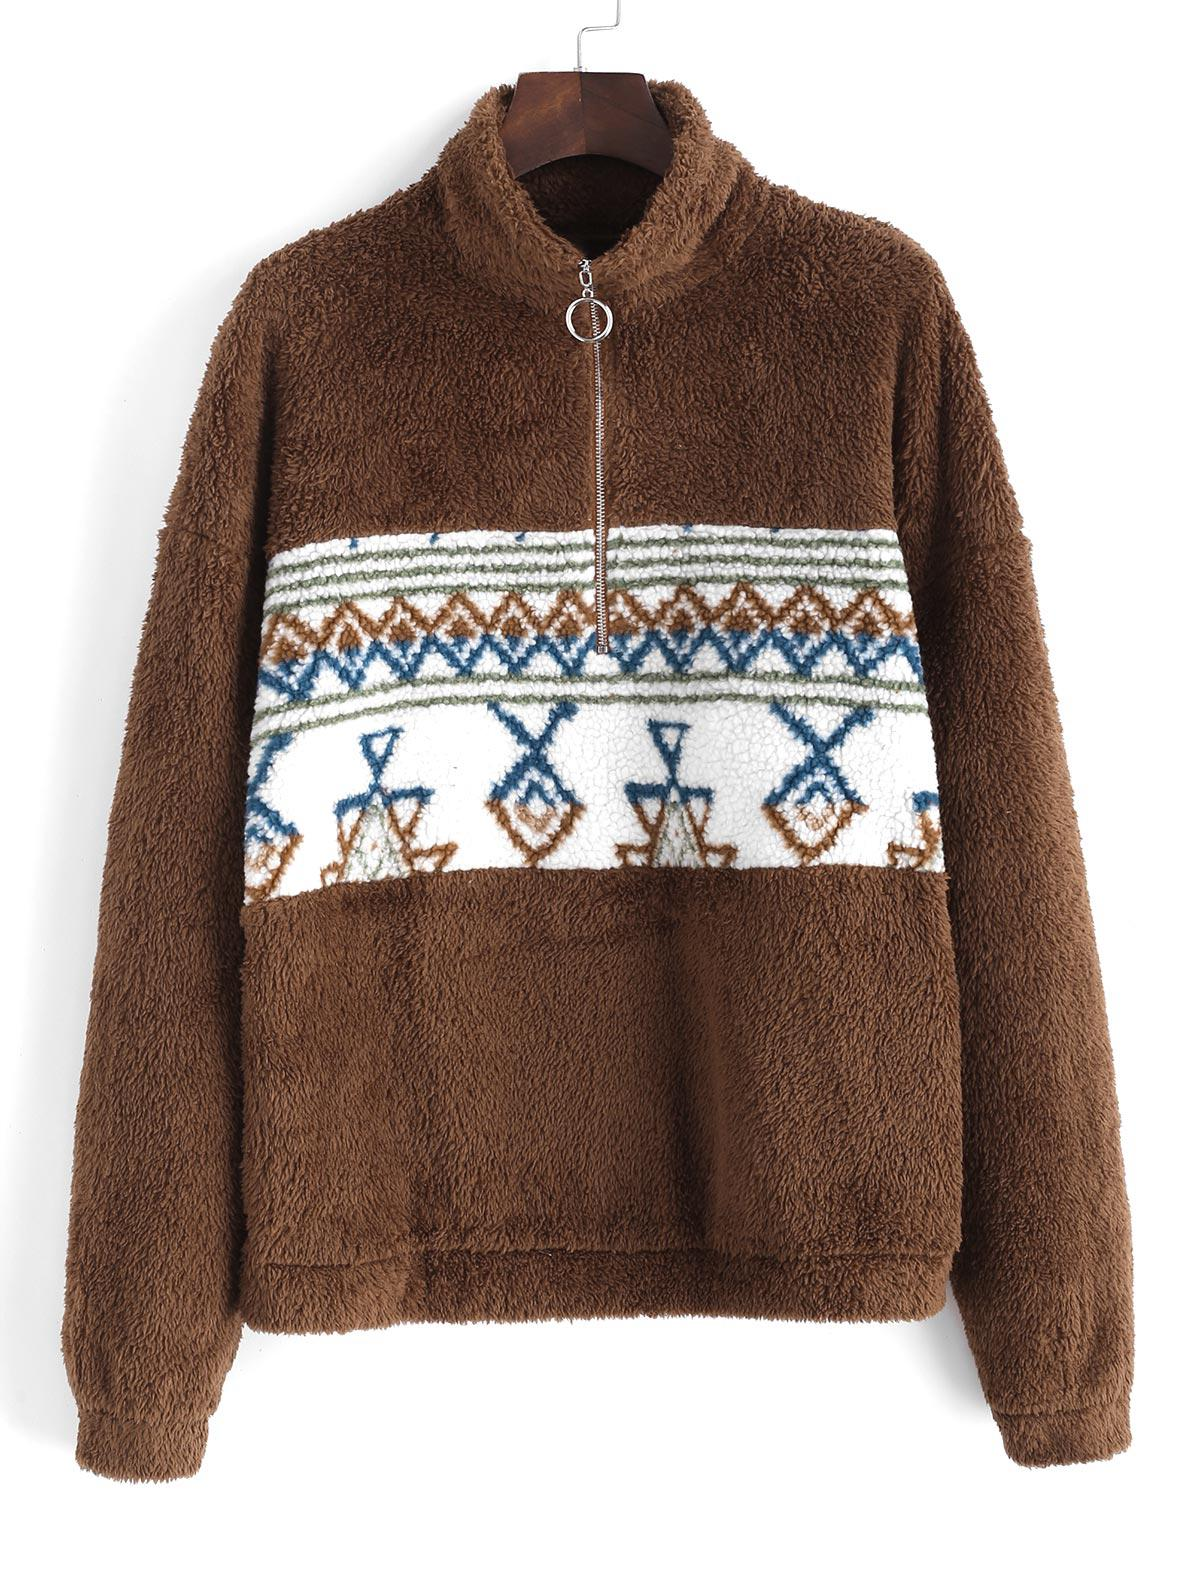 Sweat-shirt Fourré Tribal Imprimé à Demi-Zip - ZAFUL - Modalova